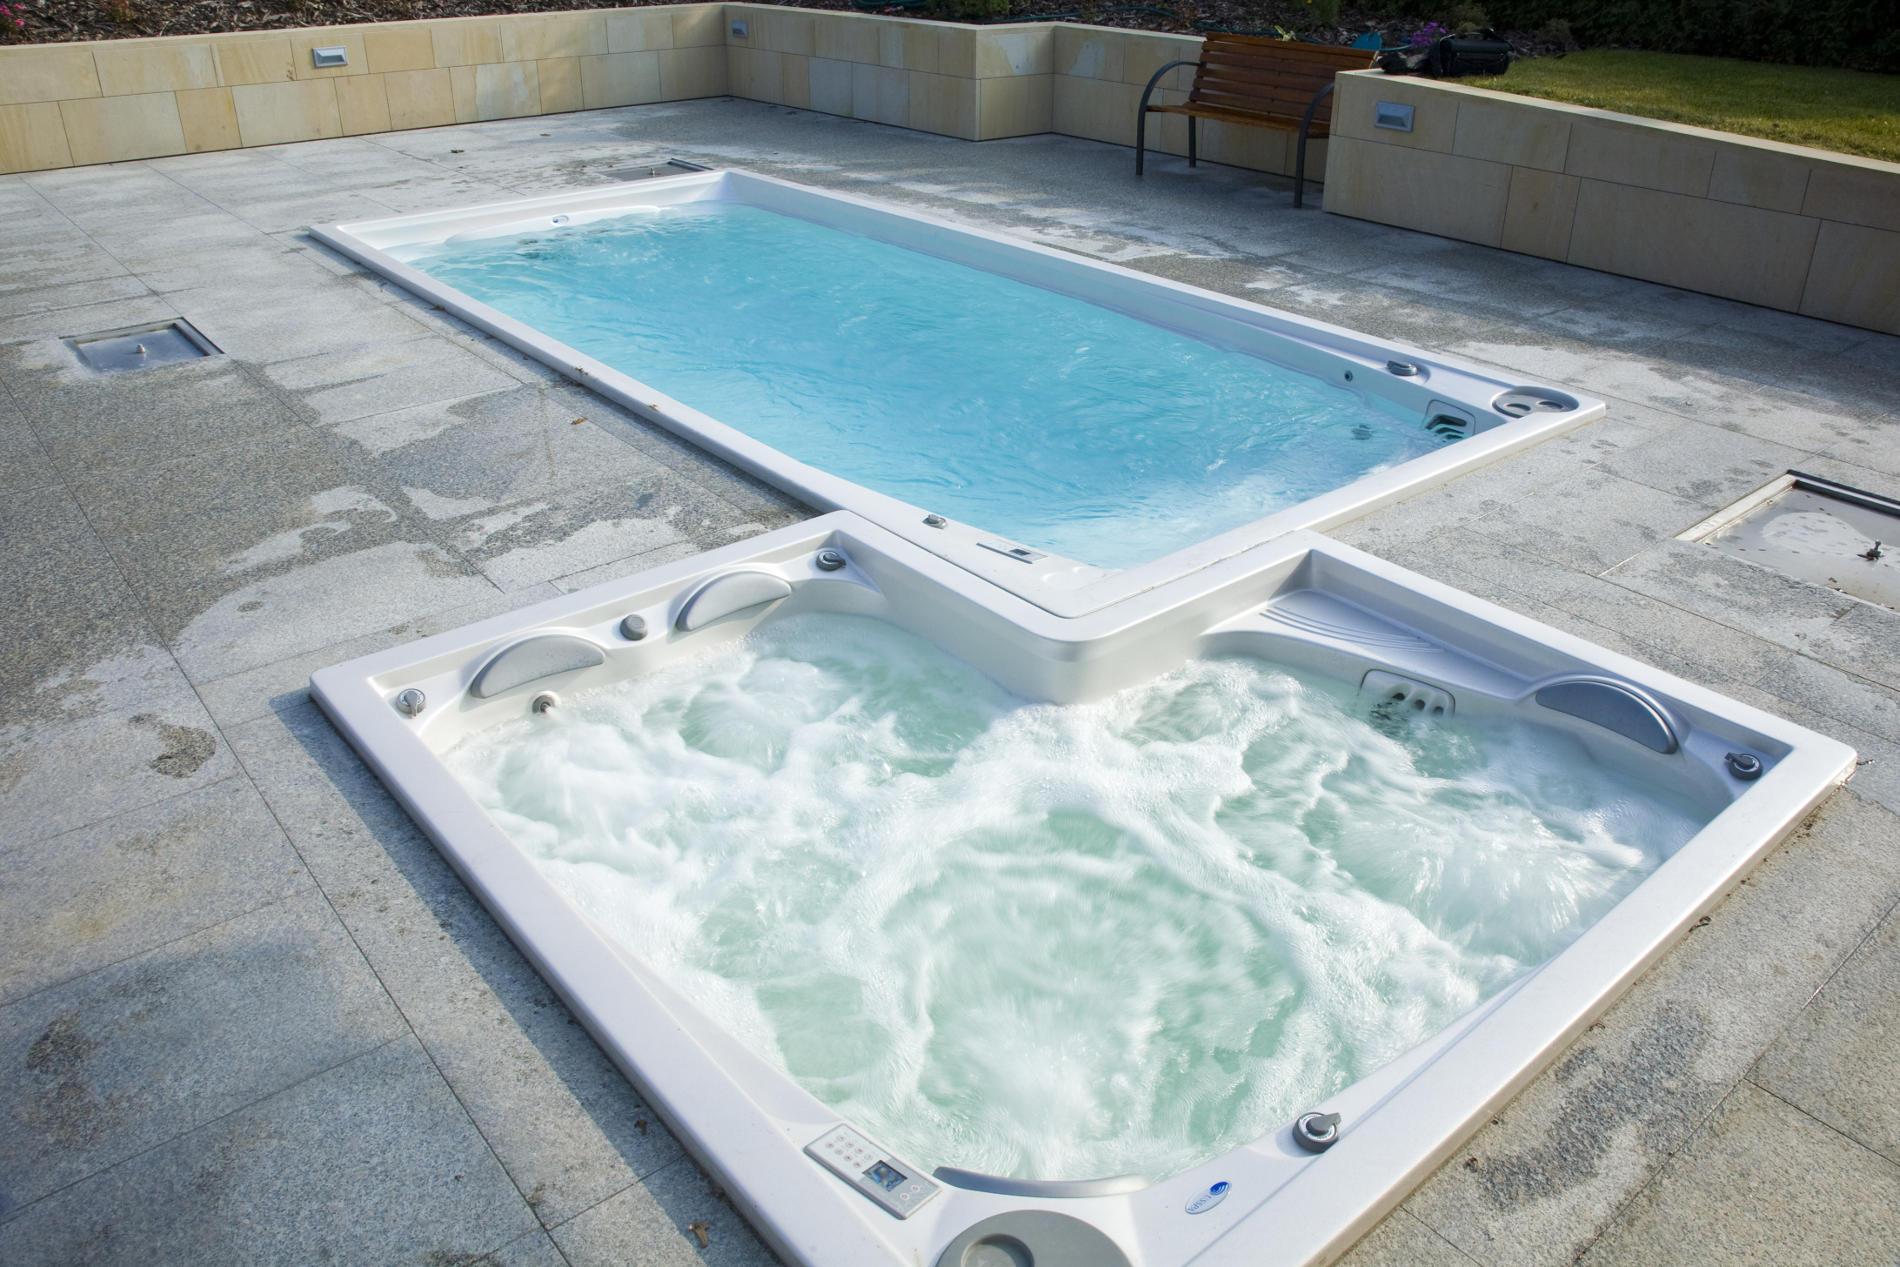 active-spa-zestaw-basen-jacuzzi-wardein